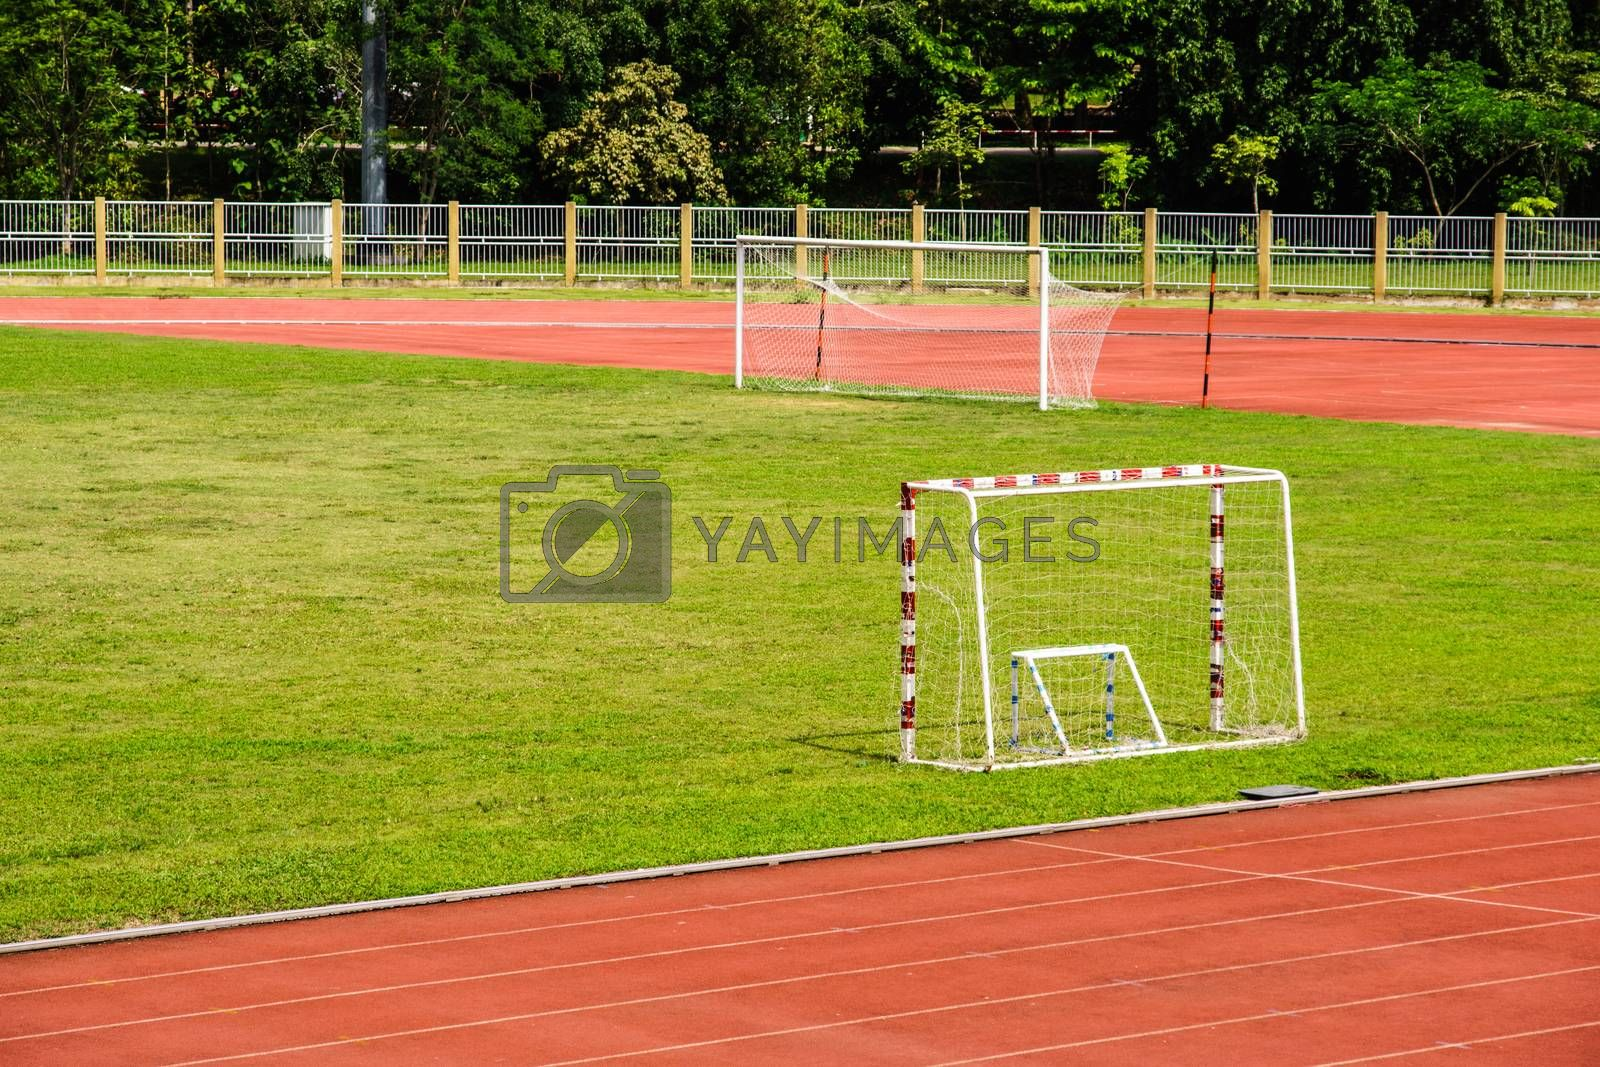 Royalty free image of tripple goal by nattapatt